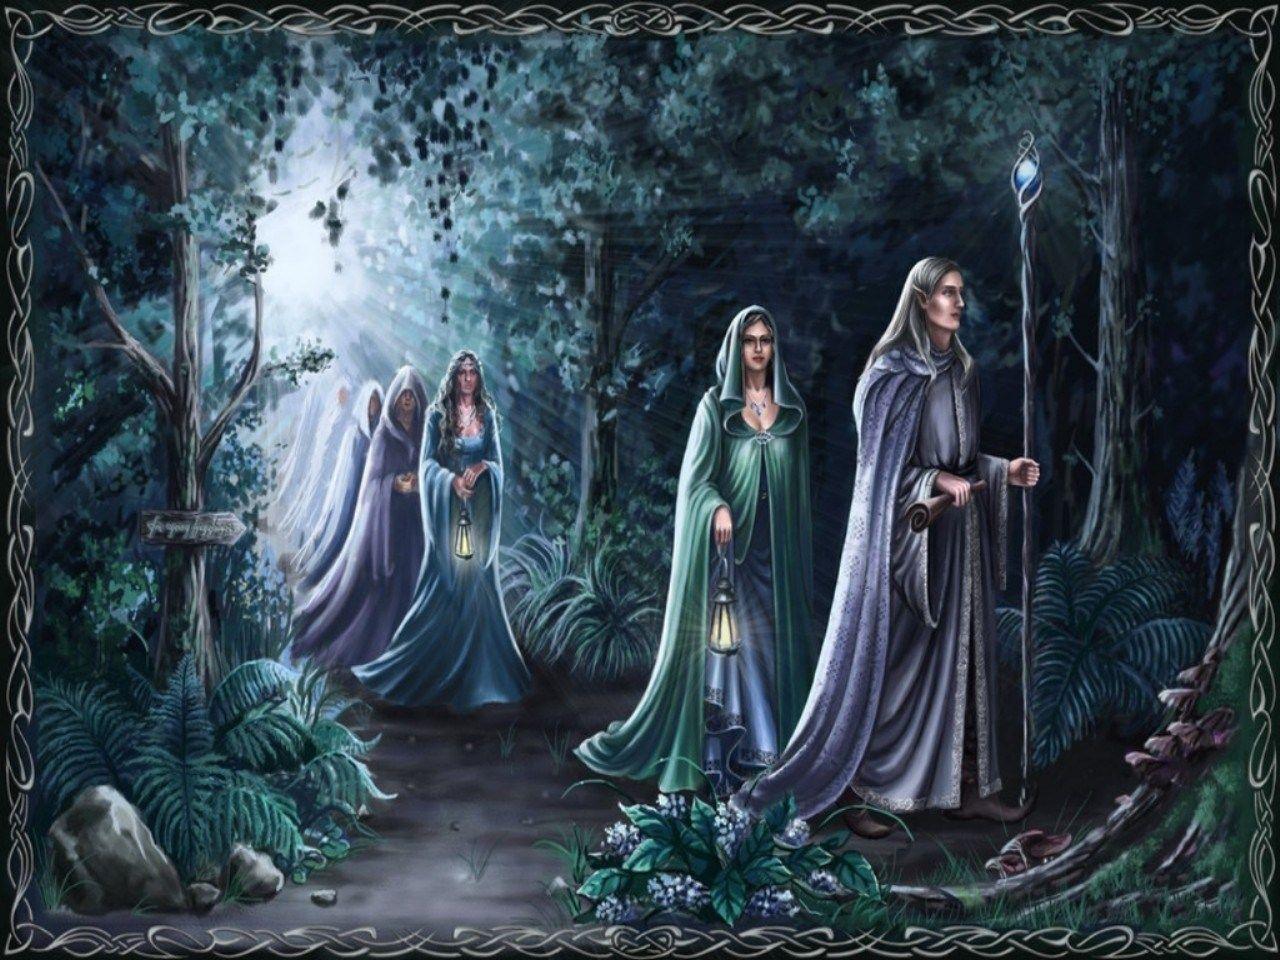 Elf Wallpaper Free Hd Widescreen 1280x960 281 Kb Elves Fantasy Middle Earth Elves